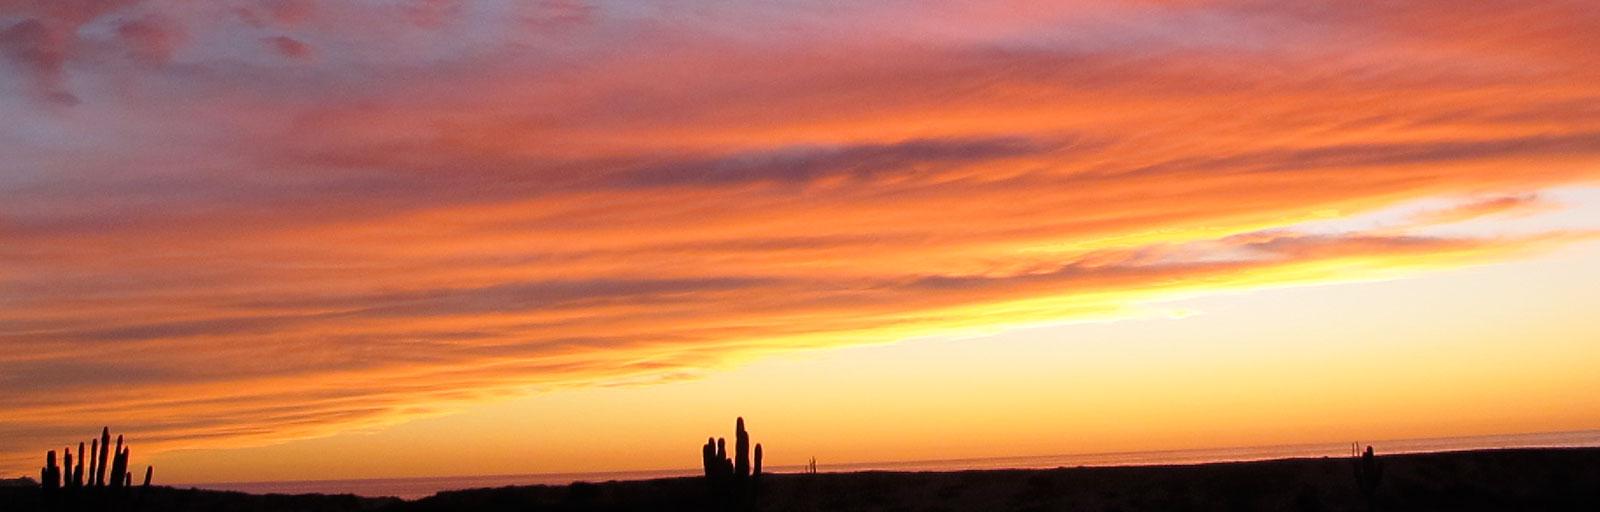 Wellness & Yoga Retreats in Baja, Mexico: Sunset Lights up the Evening Sky